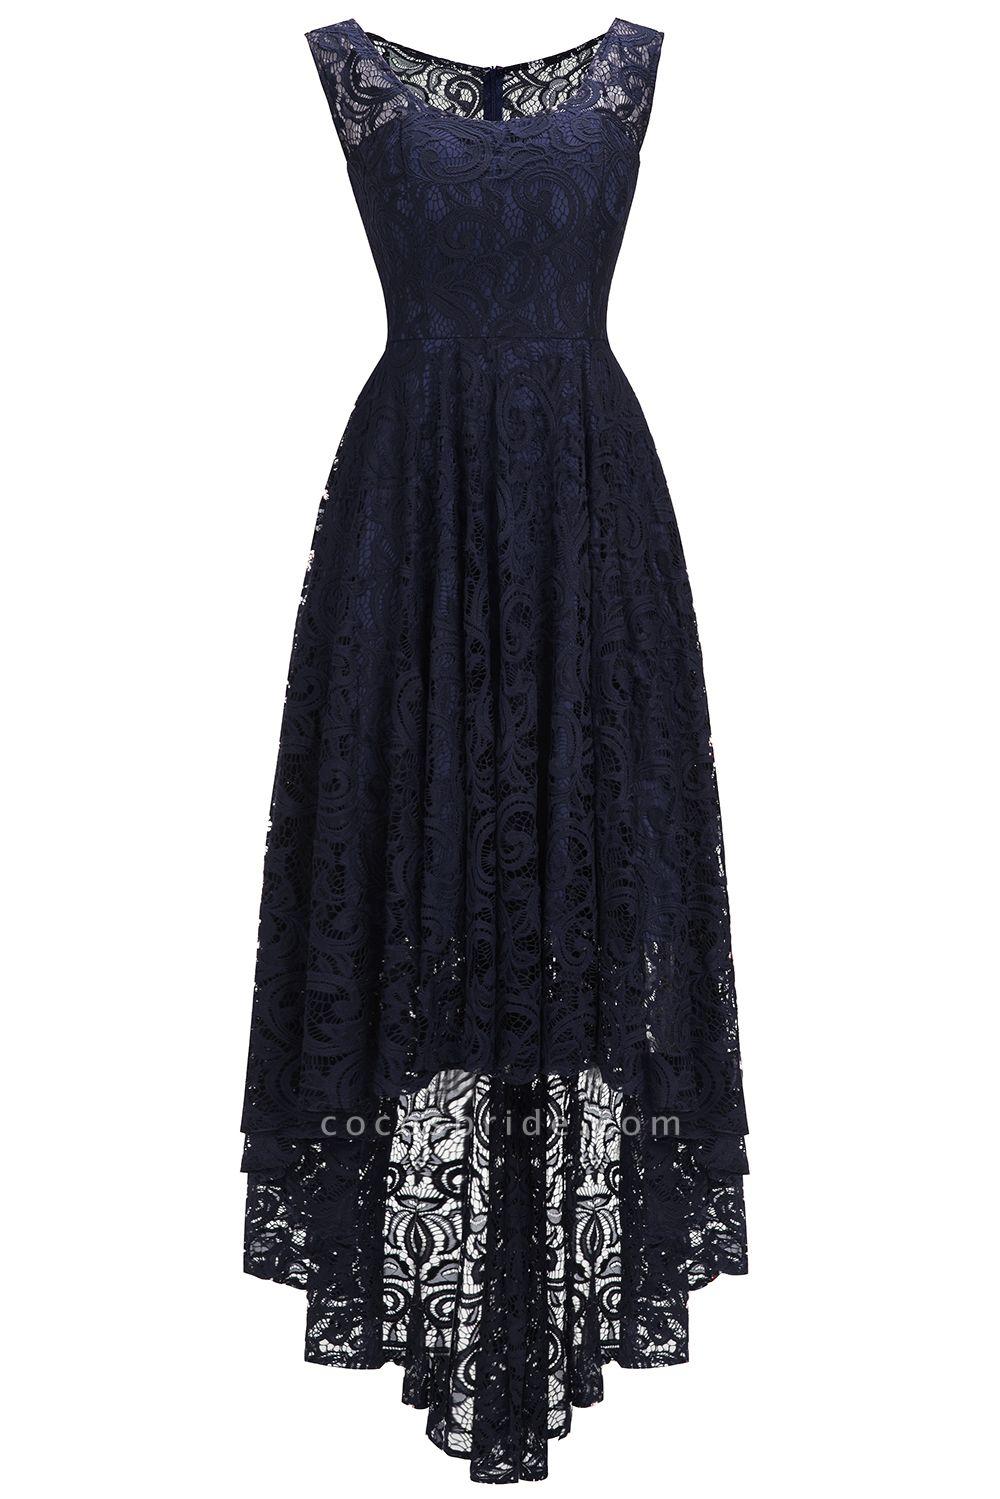 Elegant A-line Sleeveless Crew Hi-lo Lace Dress